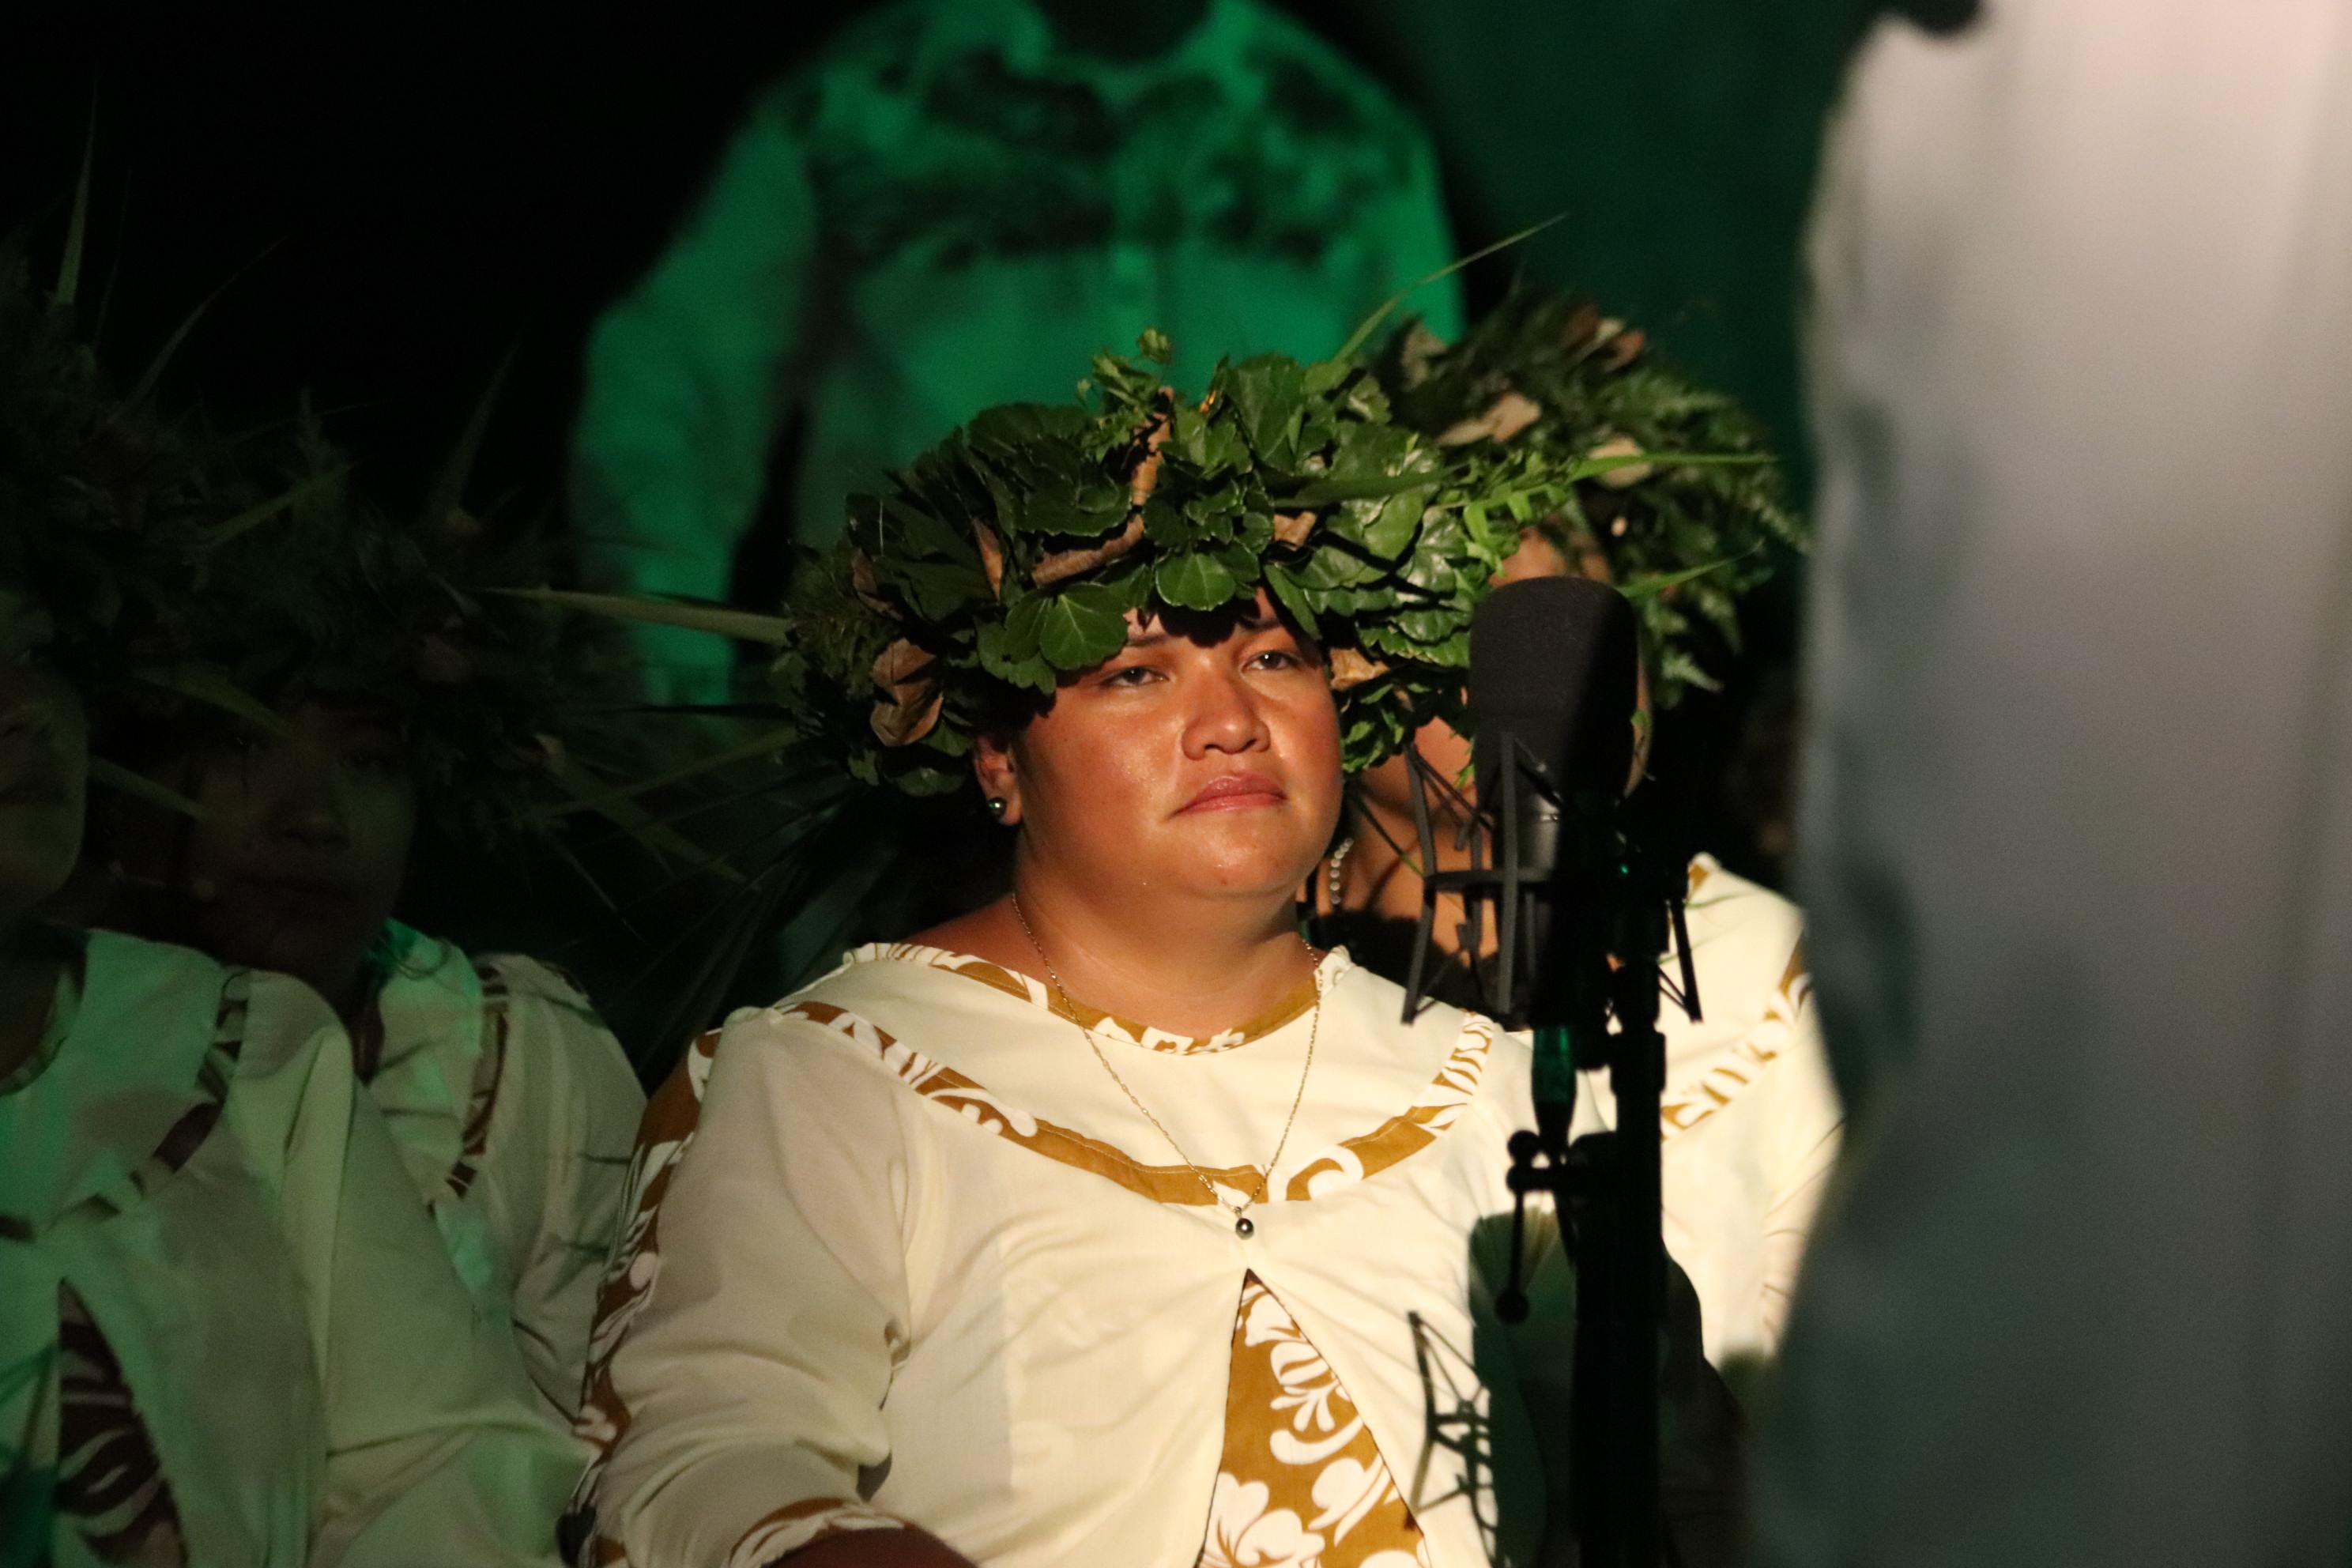 Tamanui-Apatoa-no-Papara_2577